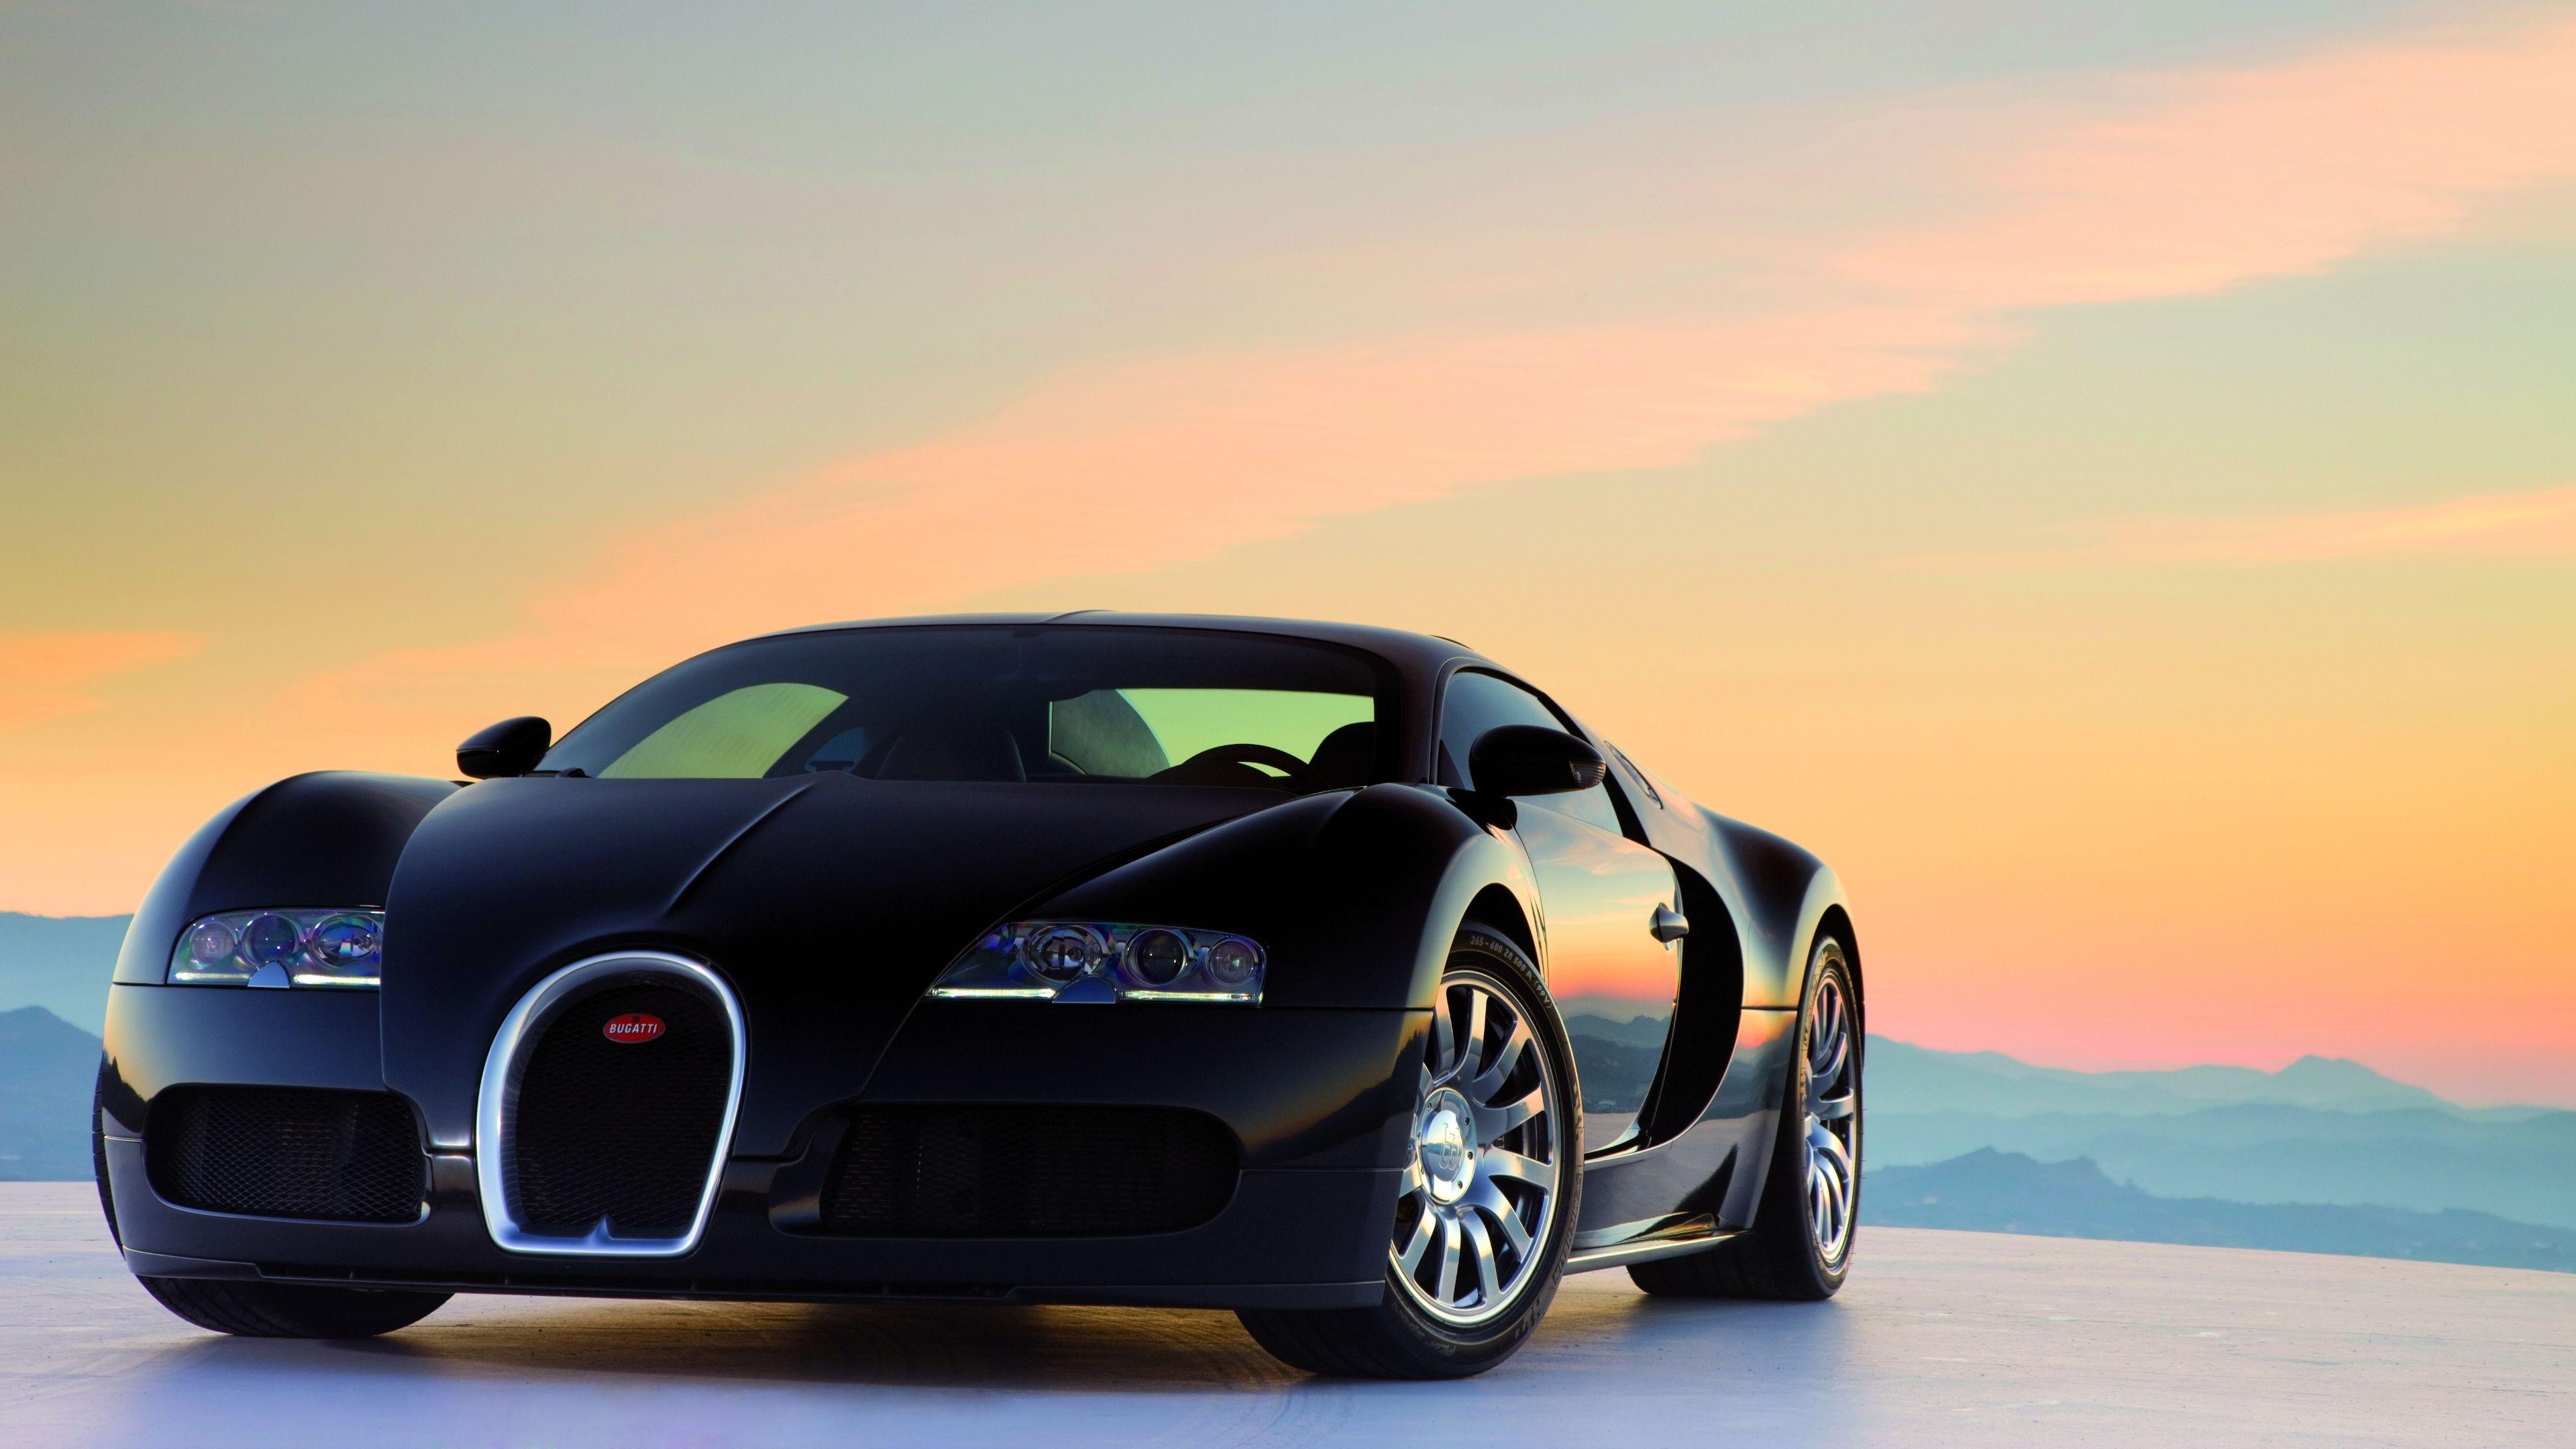 Bugatti Veyron Wallpaper Images E0i Super Cars Bugatti 1 000